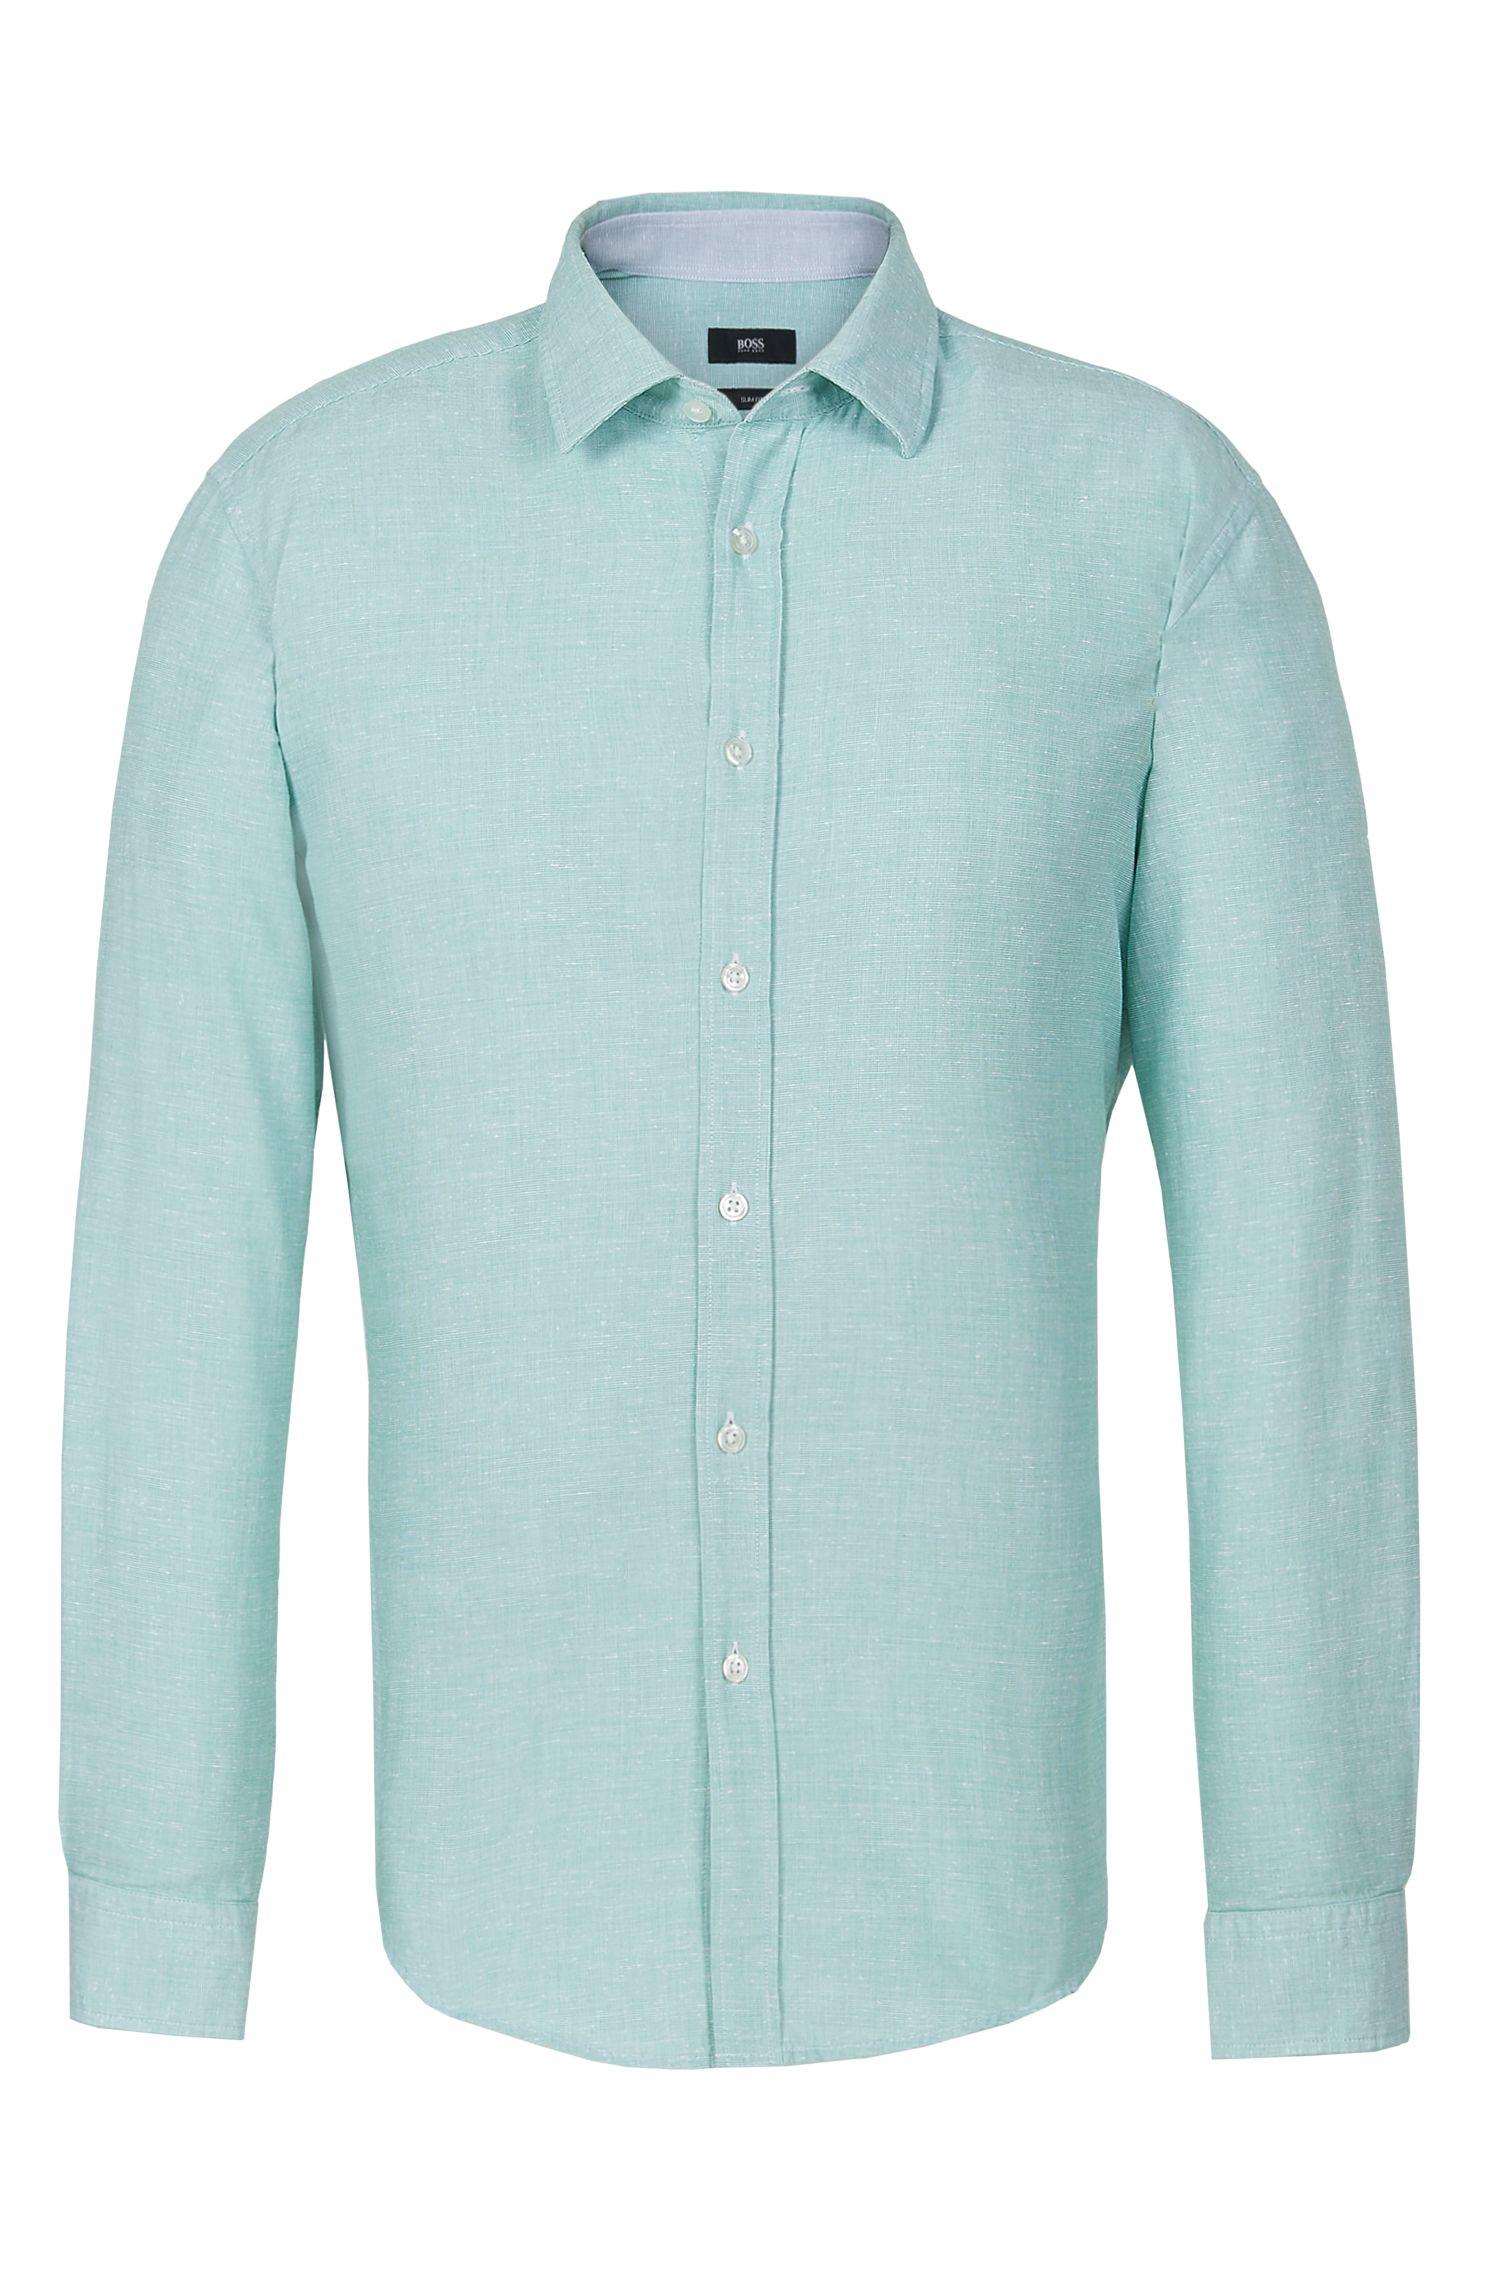 'Ronni'   Slim Fit, Cotton Button Down Shirt